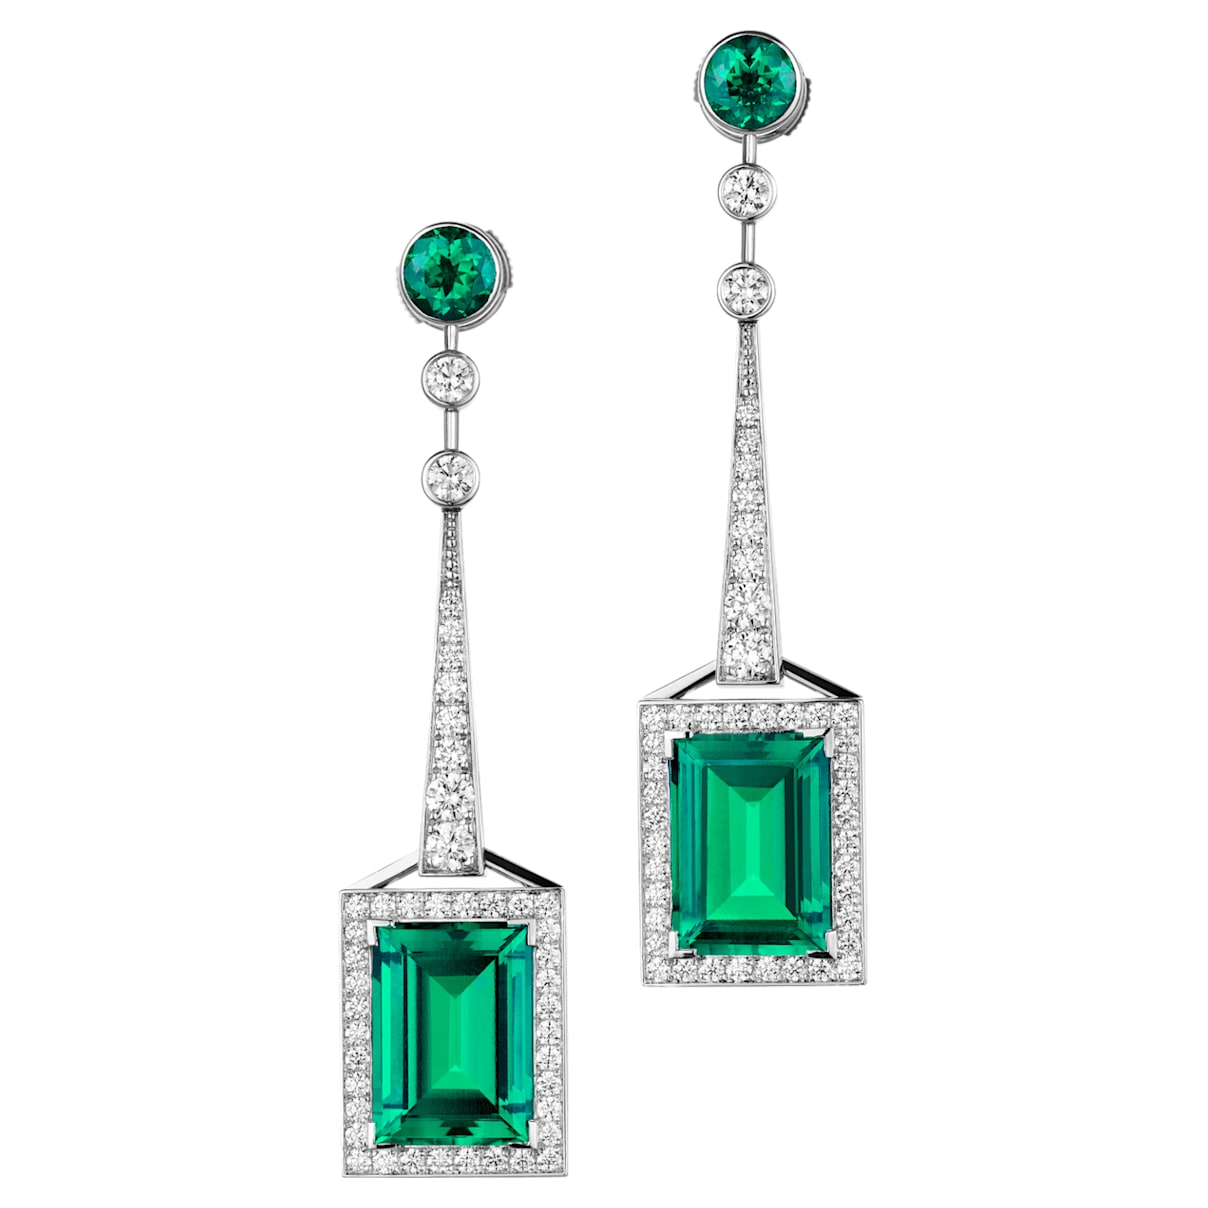 Mosaic Earrings, Swarovski Created Emeralds & Swarovski Created Diamonds, 18K White Gold